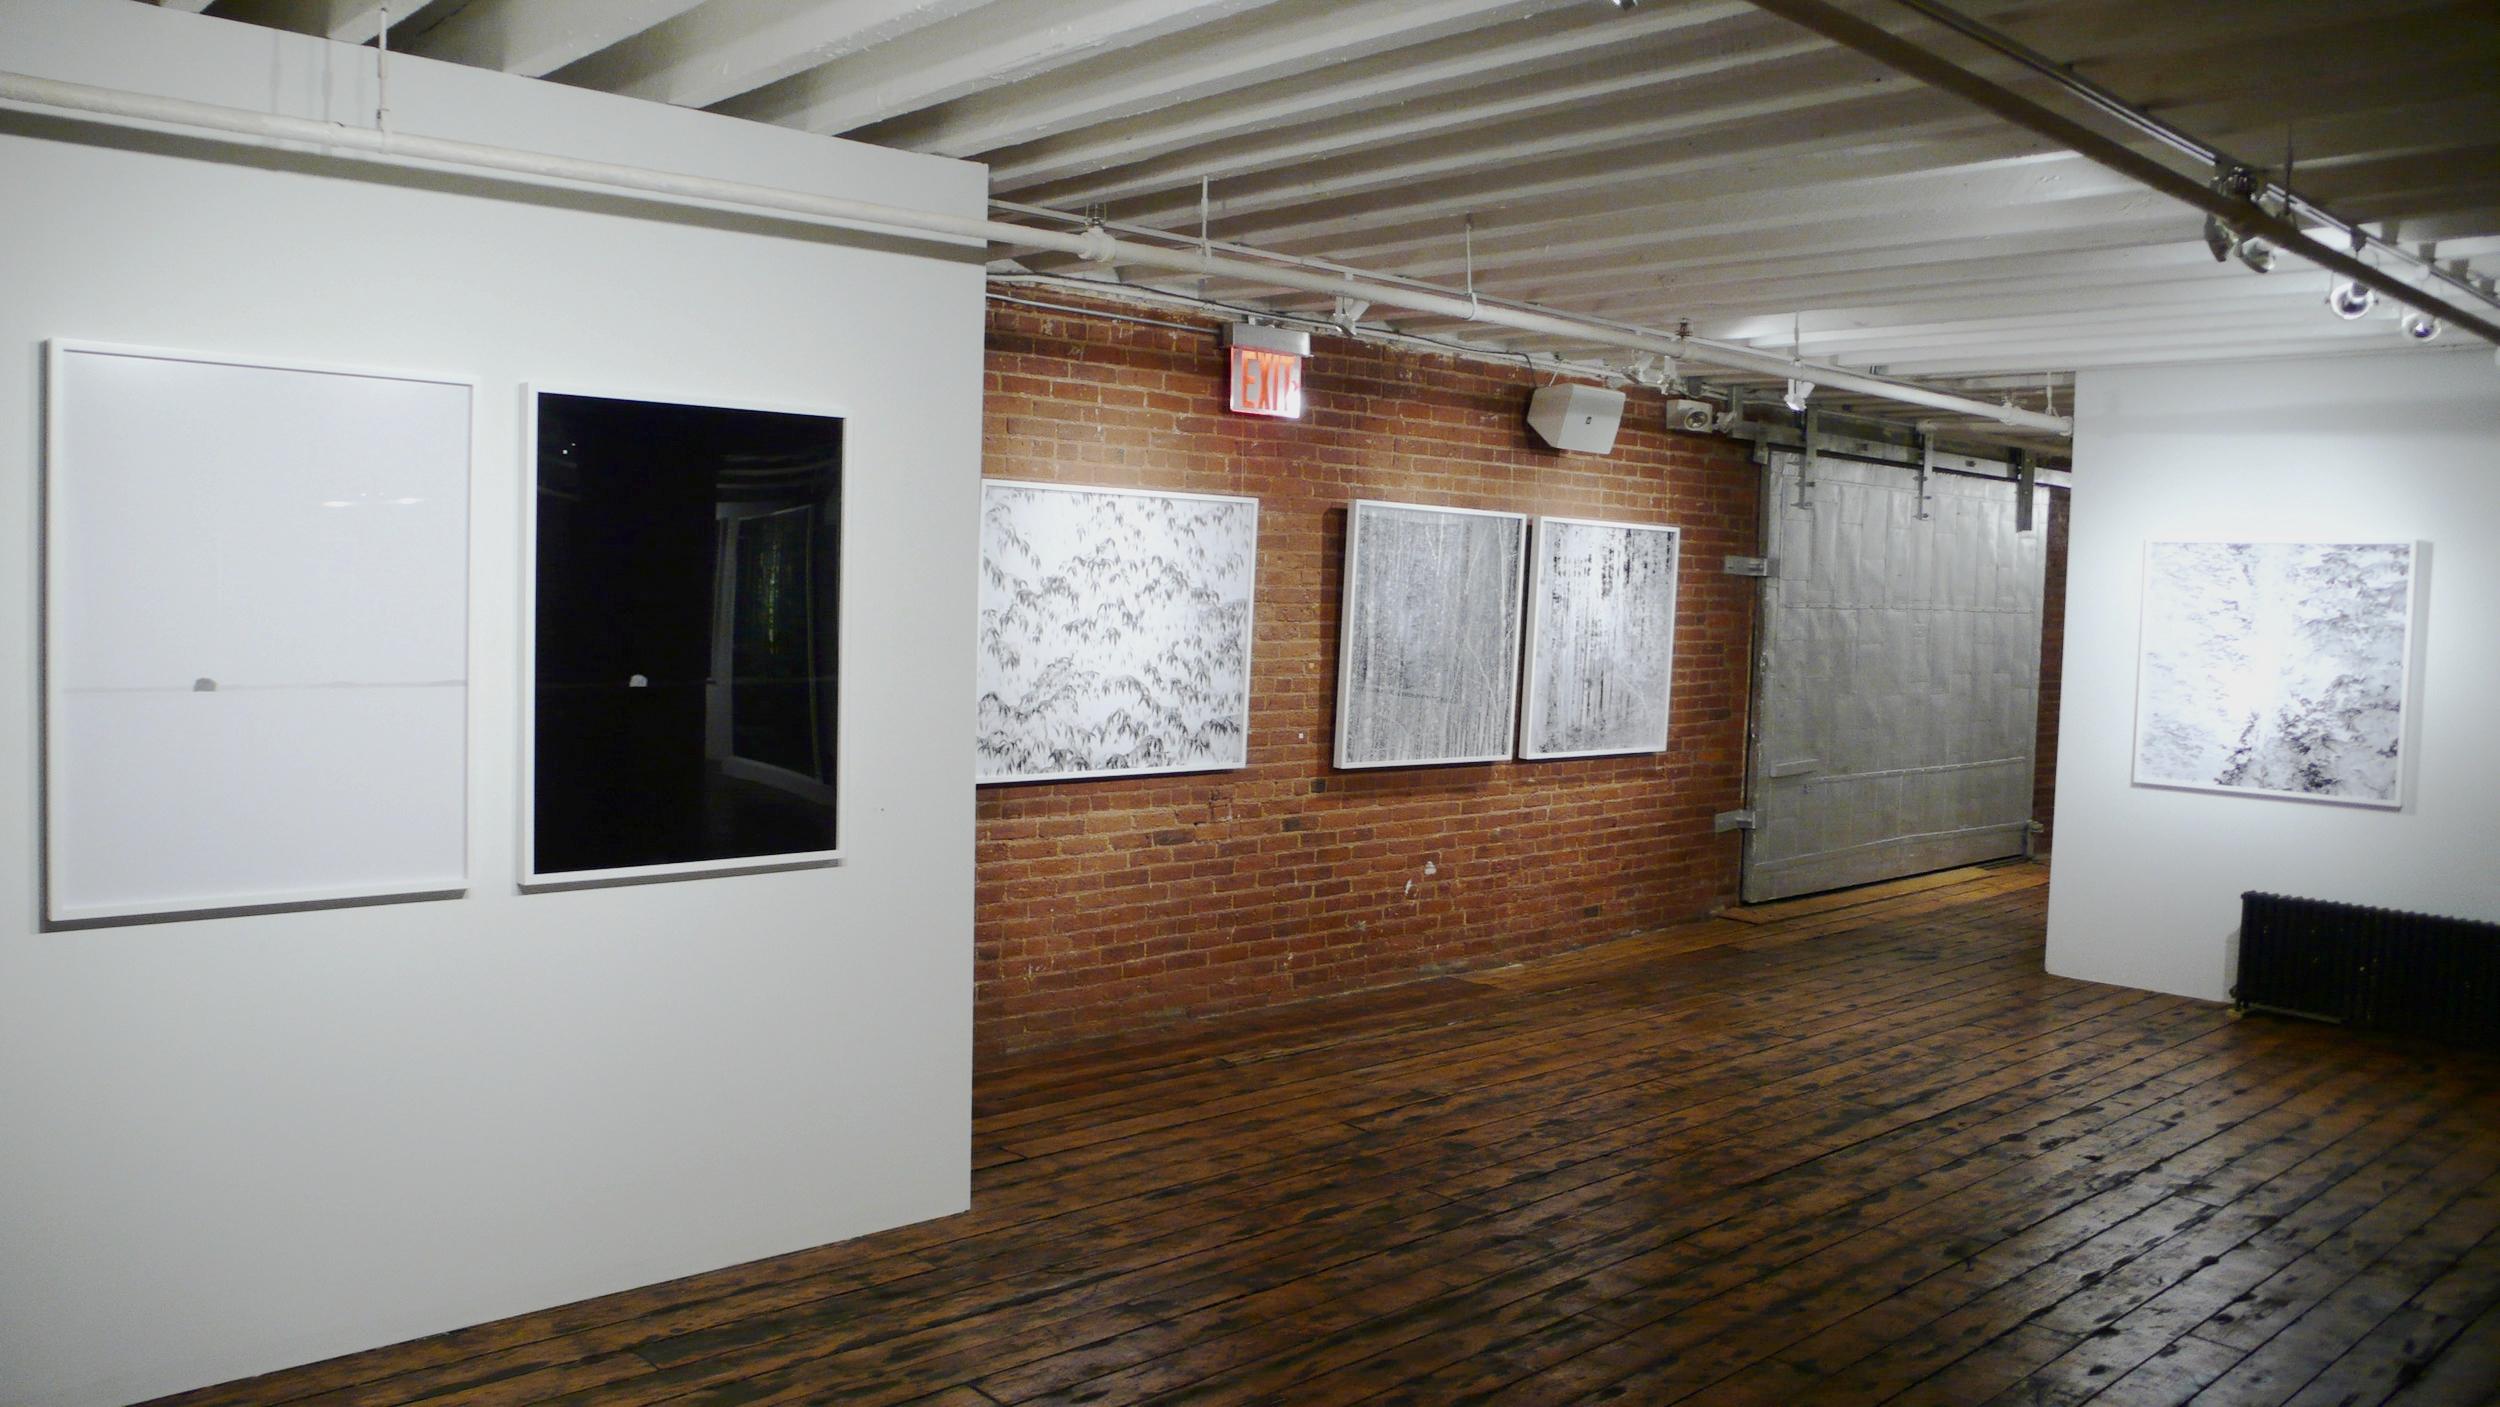 Installation view, Ithaka, 2008,New Yorker Magazine Passport To The Arts